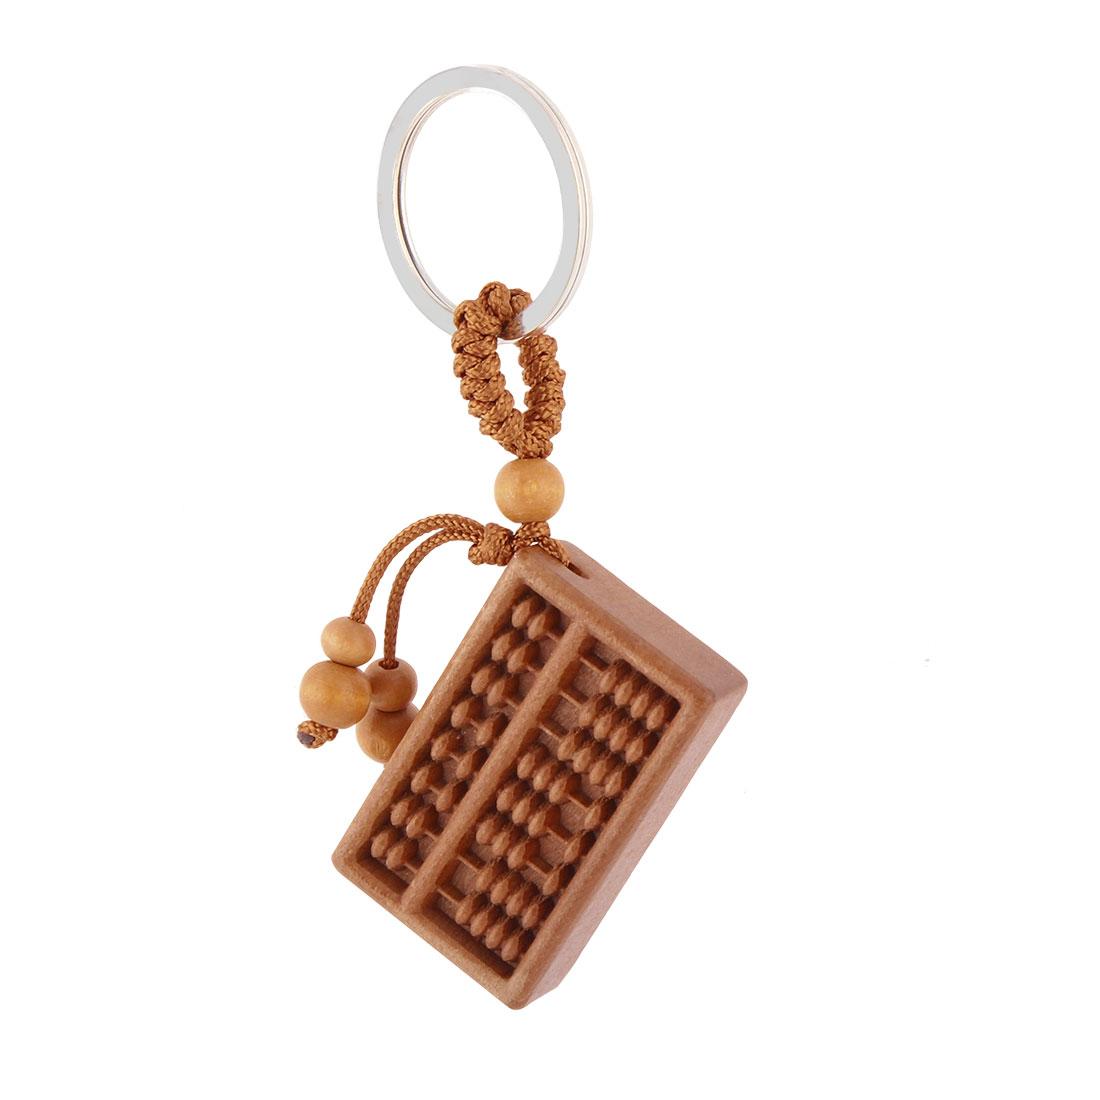 Wooden Rectangle Shaped Pendant Split Ring Keyring Handbag Purse Ornament Brown